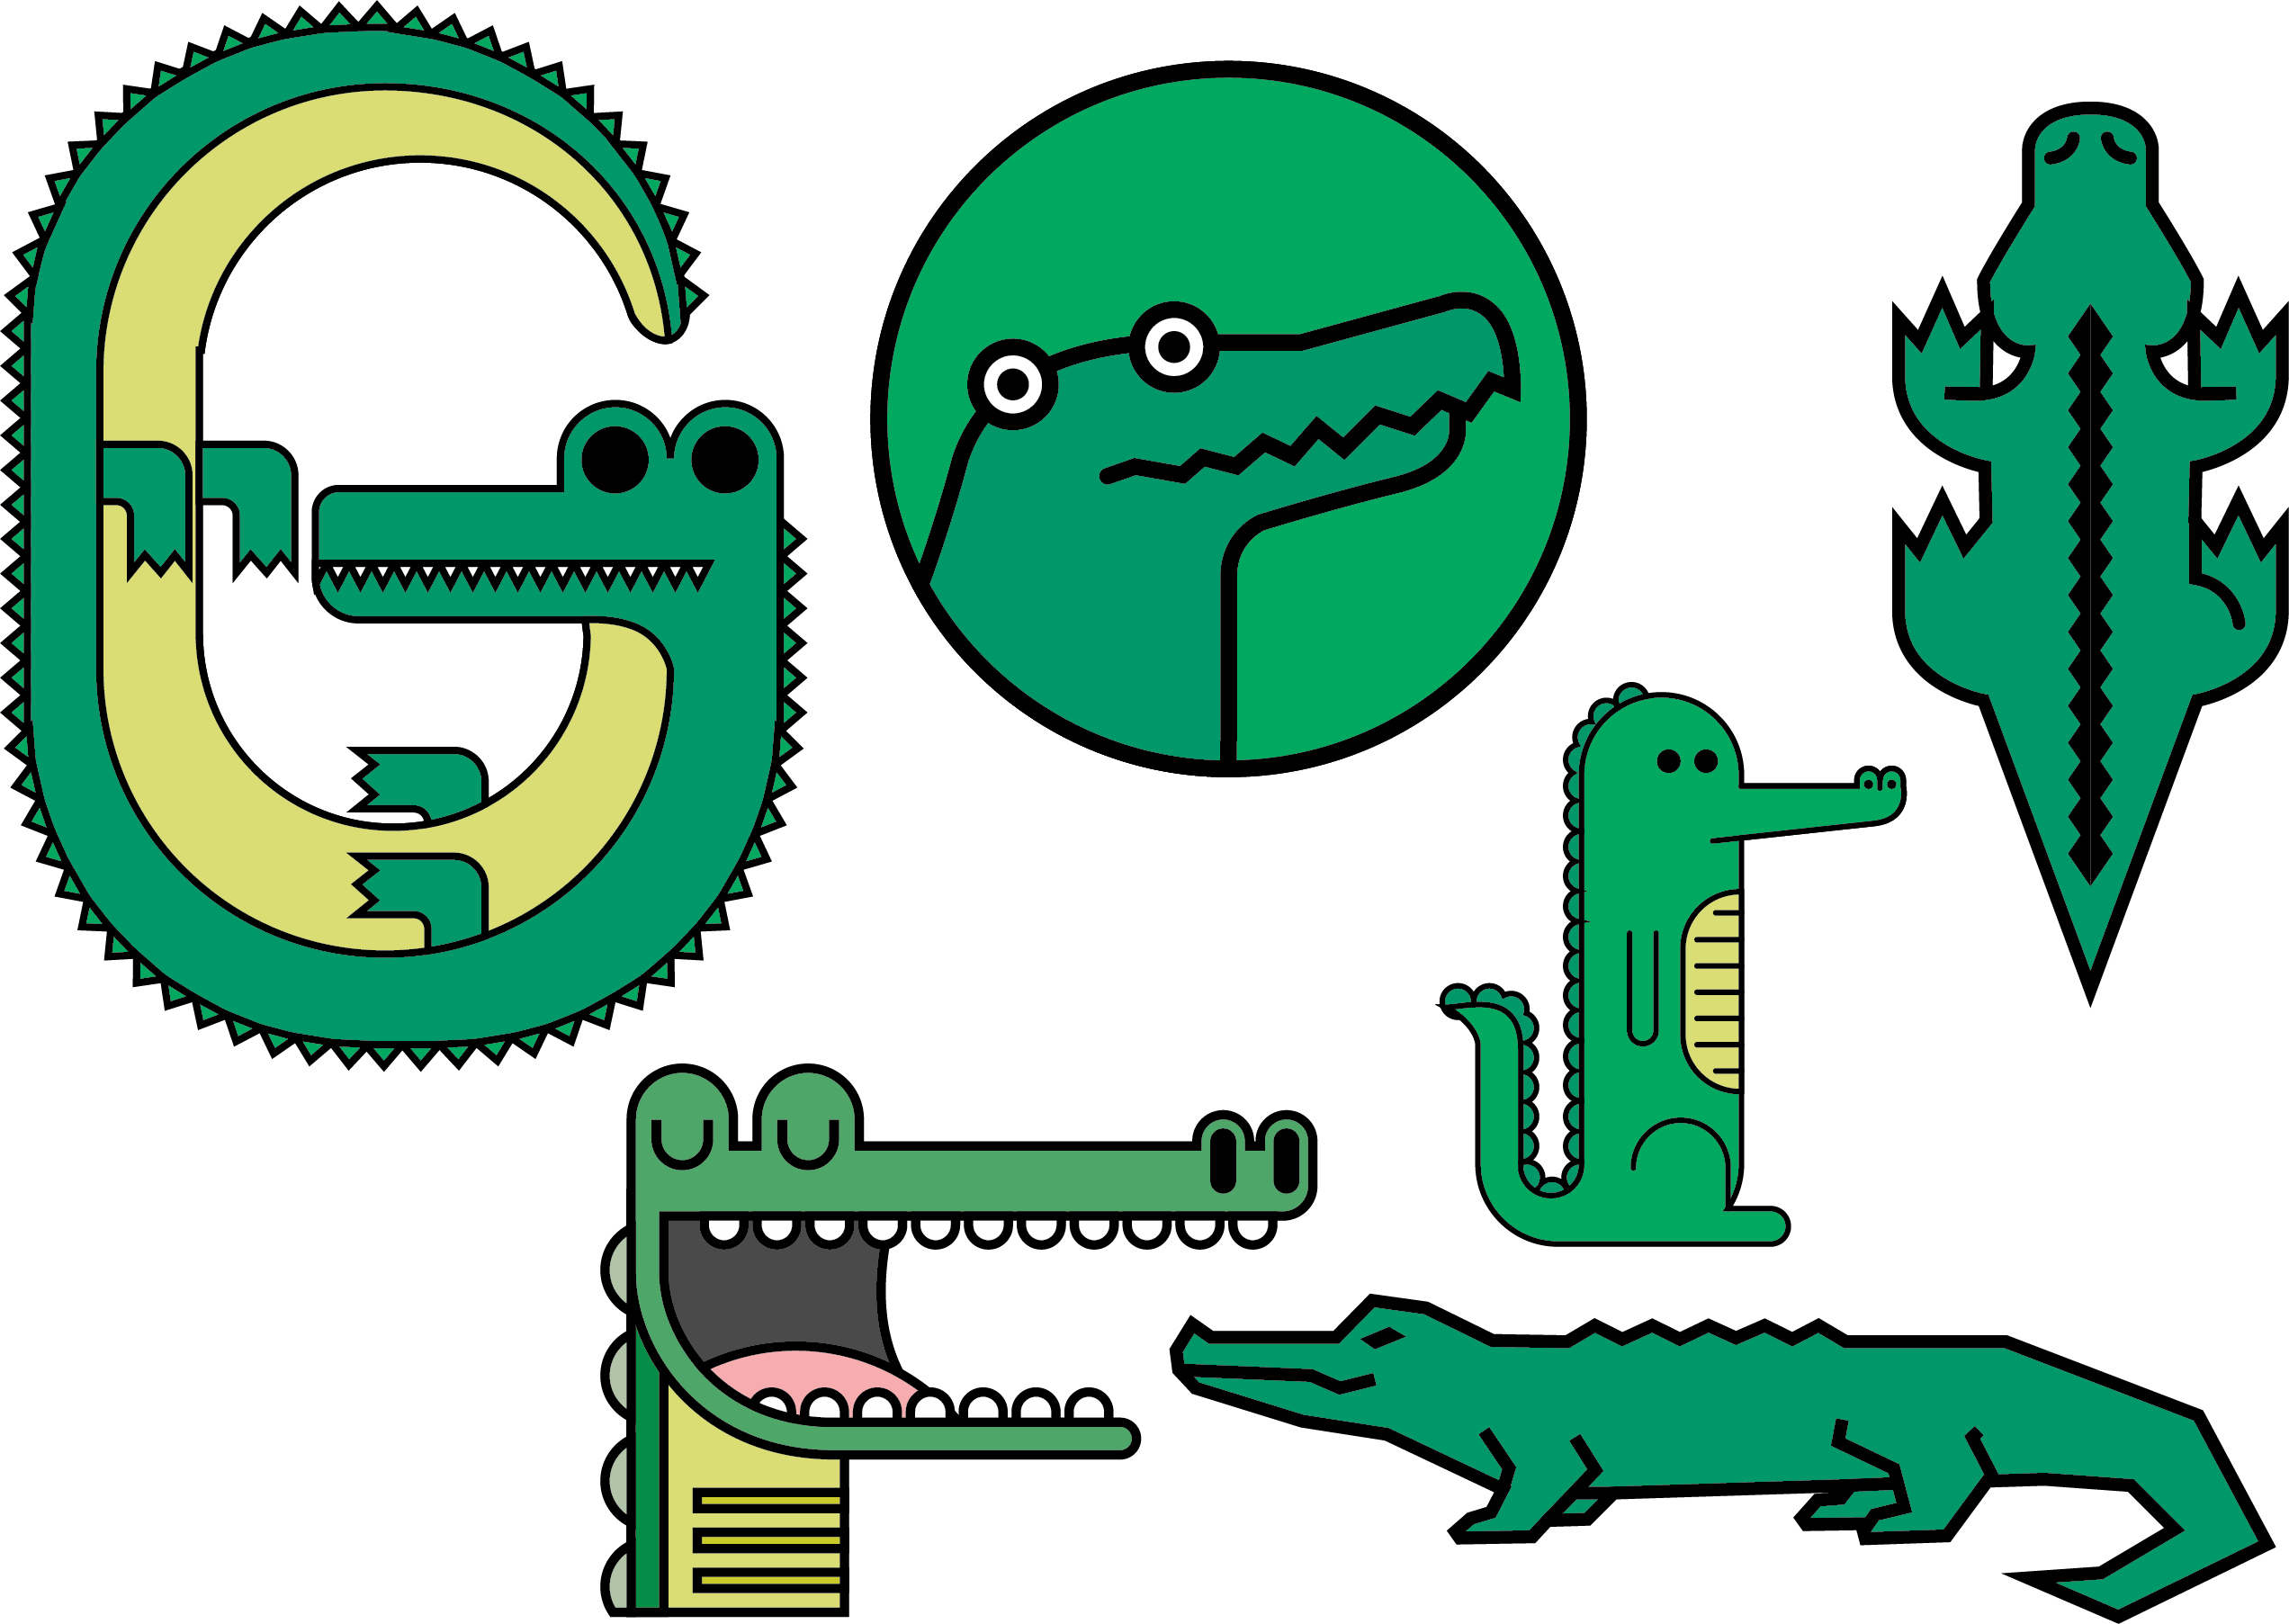 Gator clipart american alligator. Crocodile vector illustration png